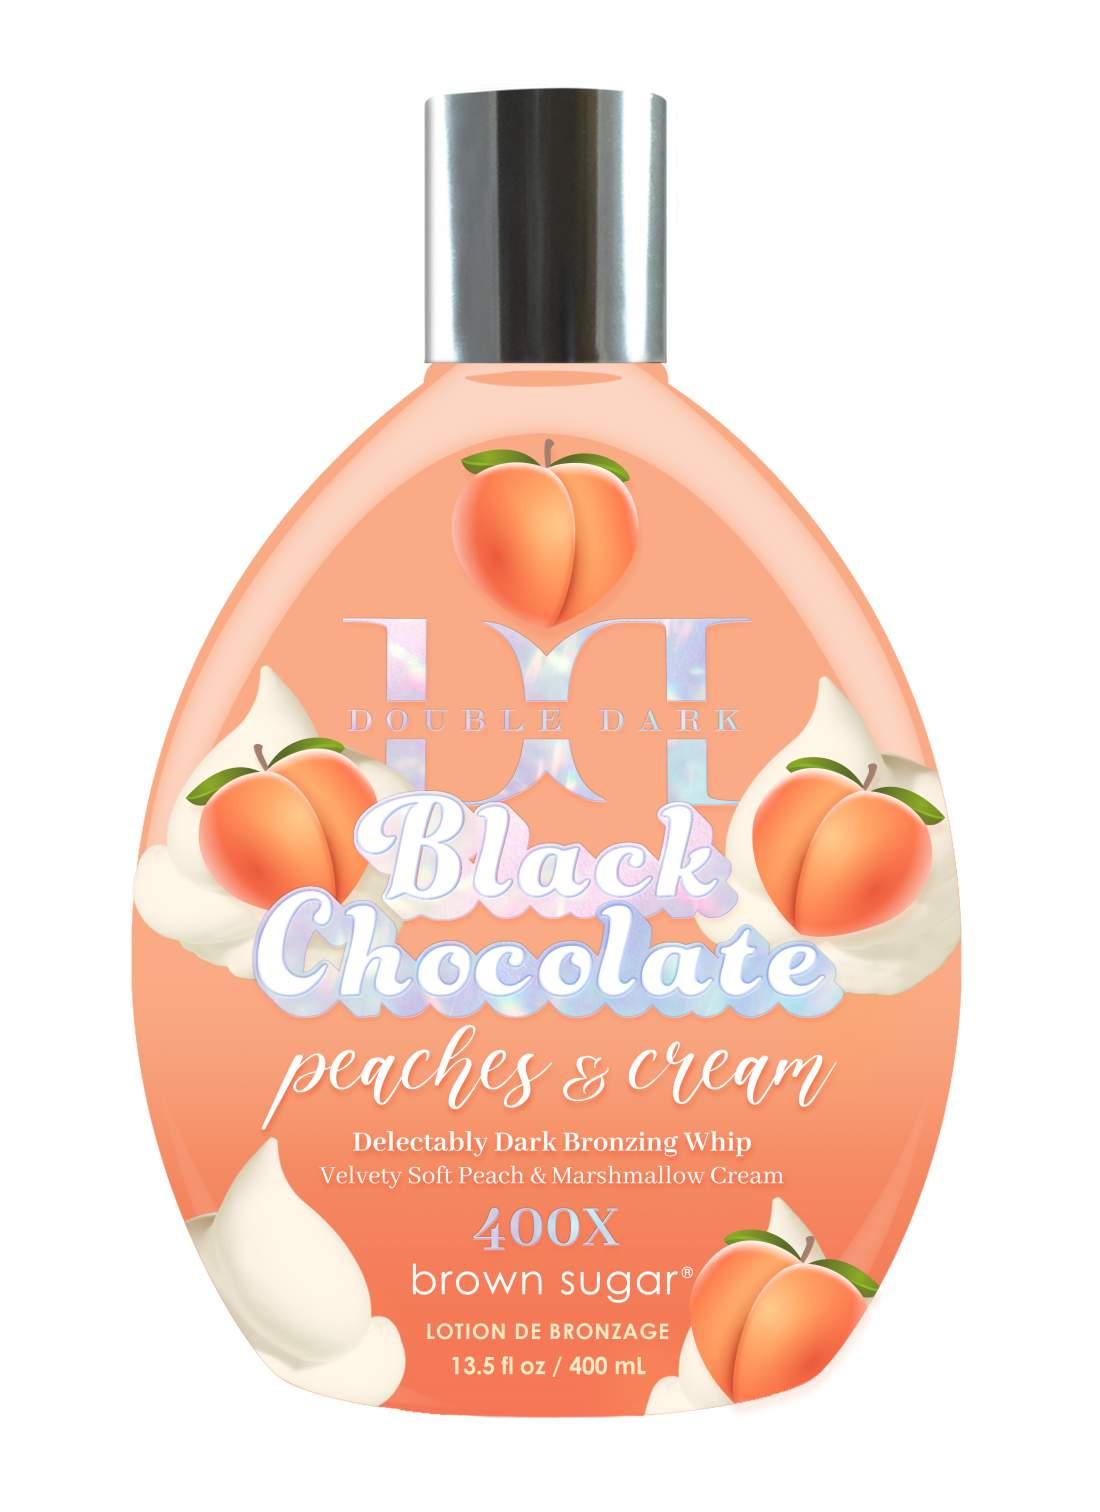 Double Dark Black Chocolate Peaches & Cream 400x (400 ml)